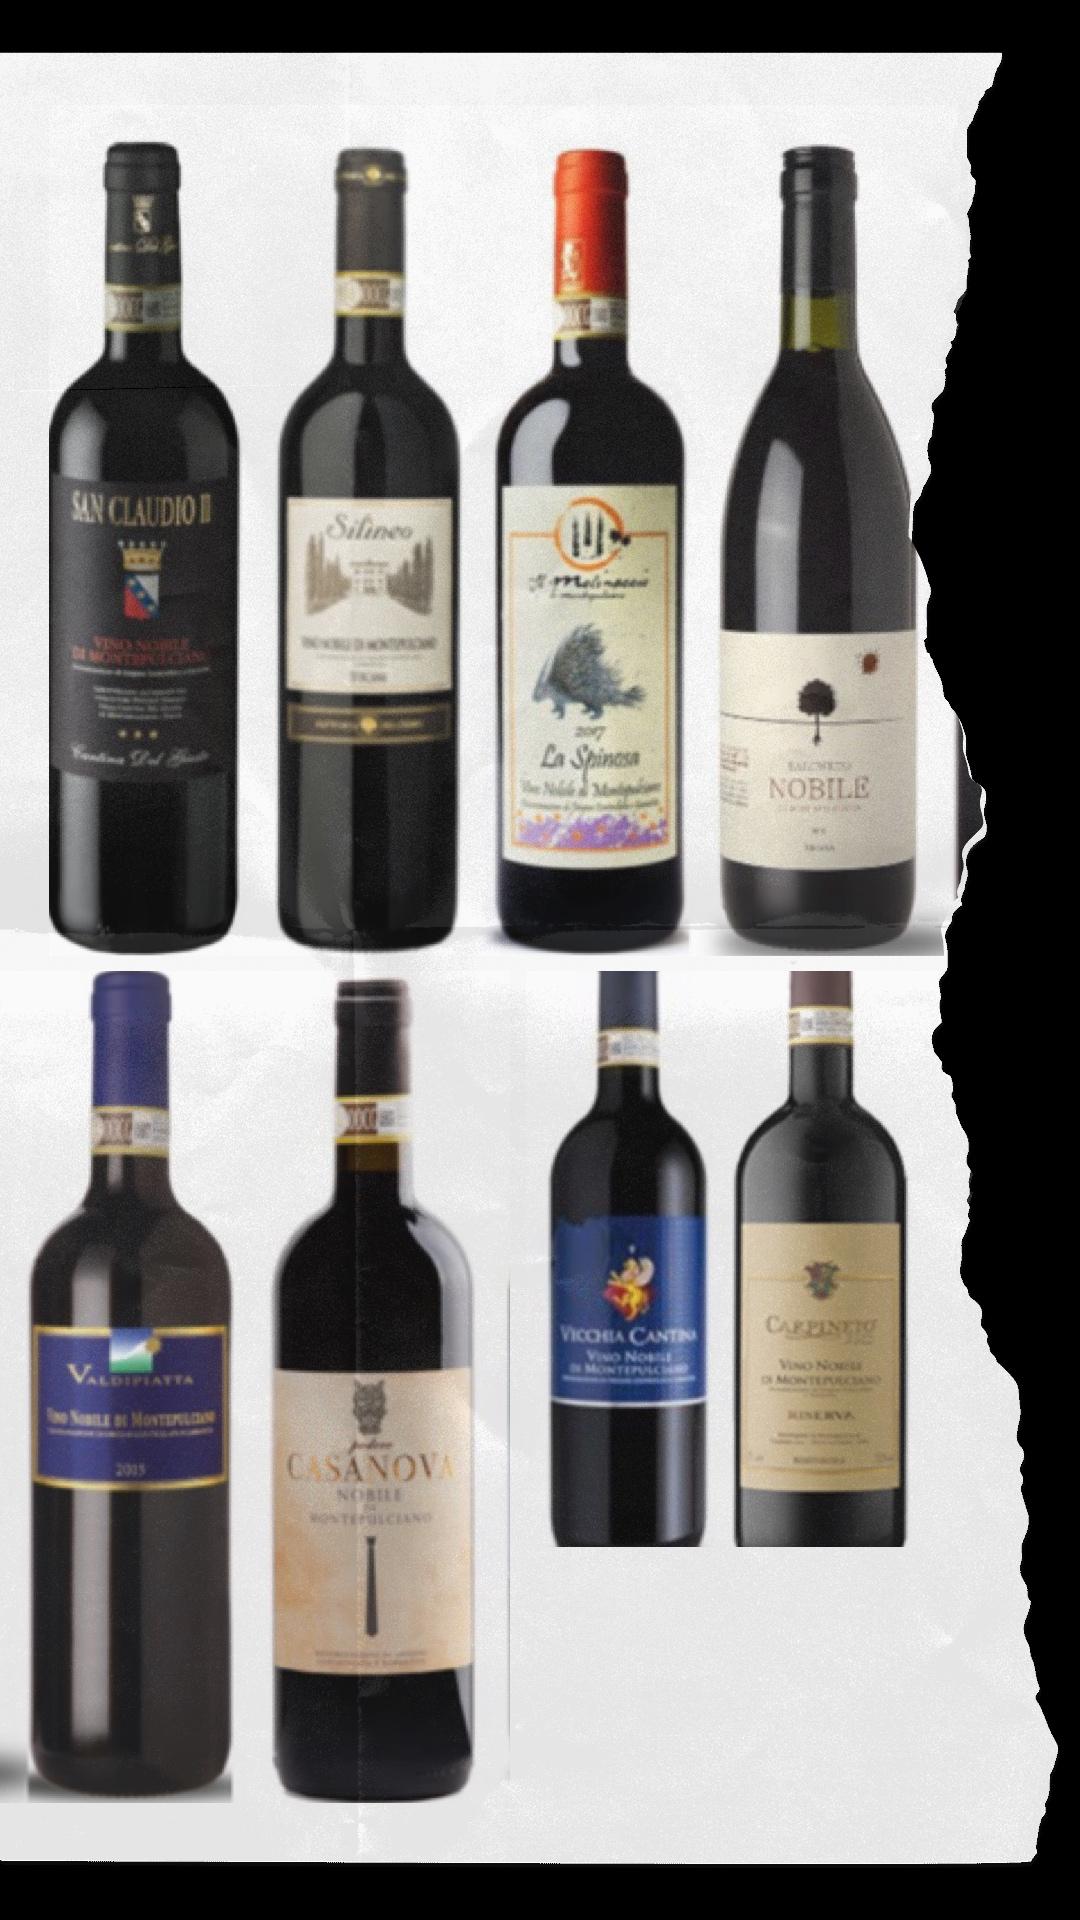 Celebrating Wines of Italy: Vino Nobile di Montepulciano